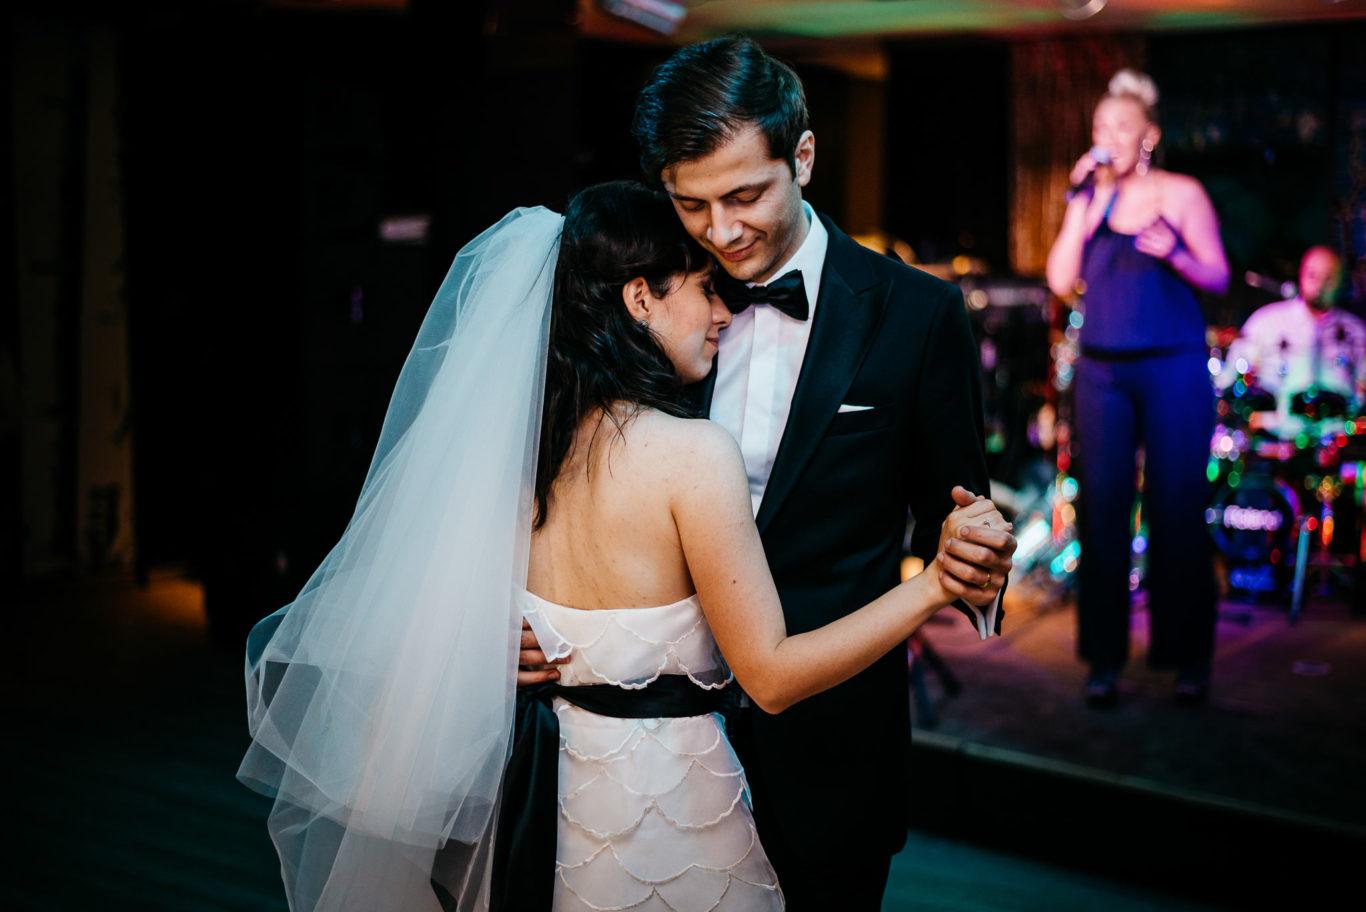 0920-Fotografie-nunta-Simona-Valentin-fotograf-Ciprian-Dumitrescu-DSC_2714